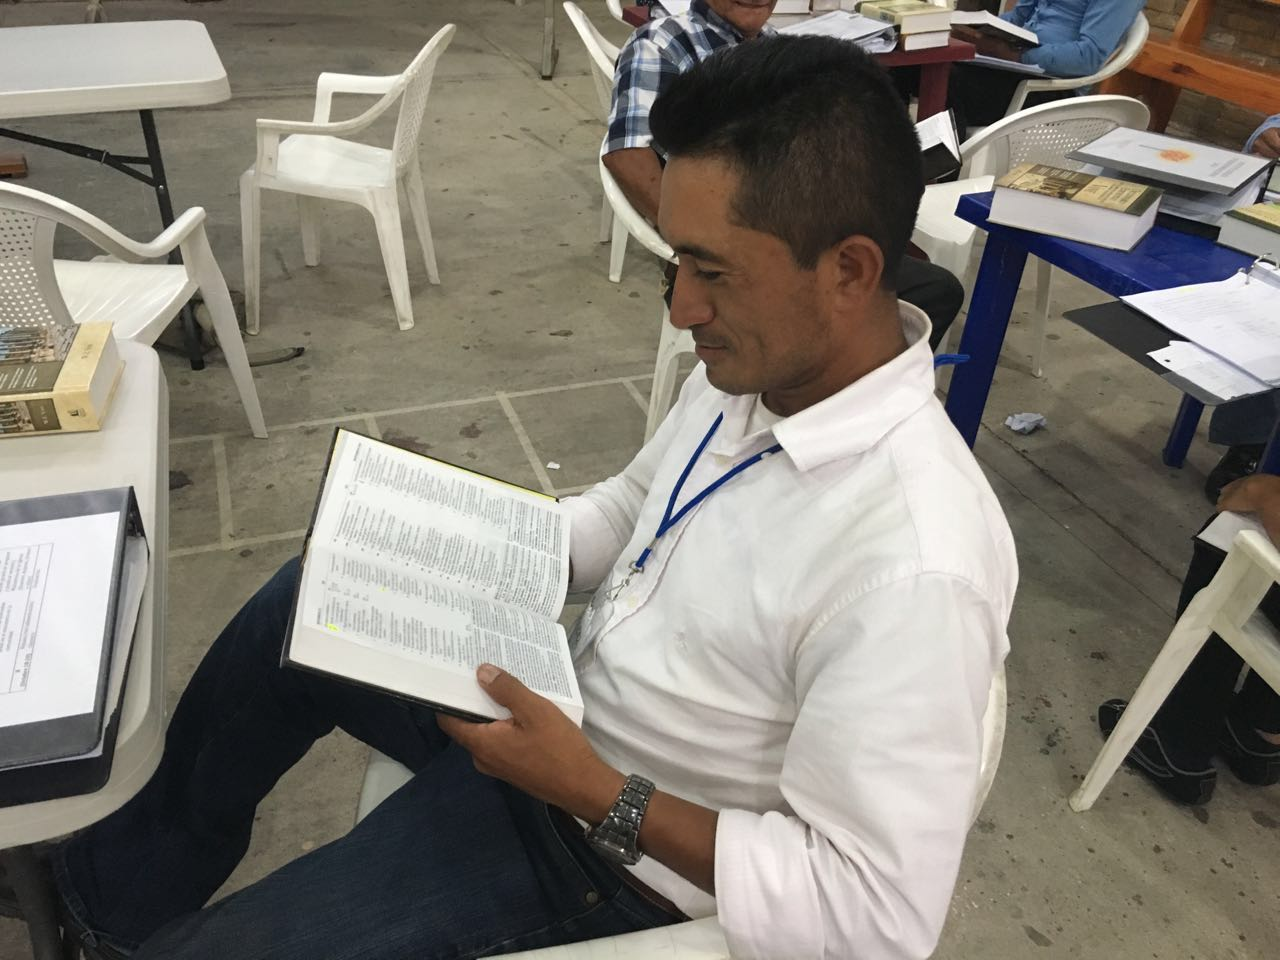 Countdown to Pastors' Training School